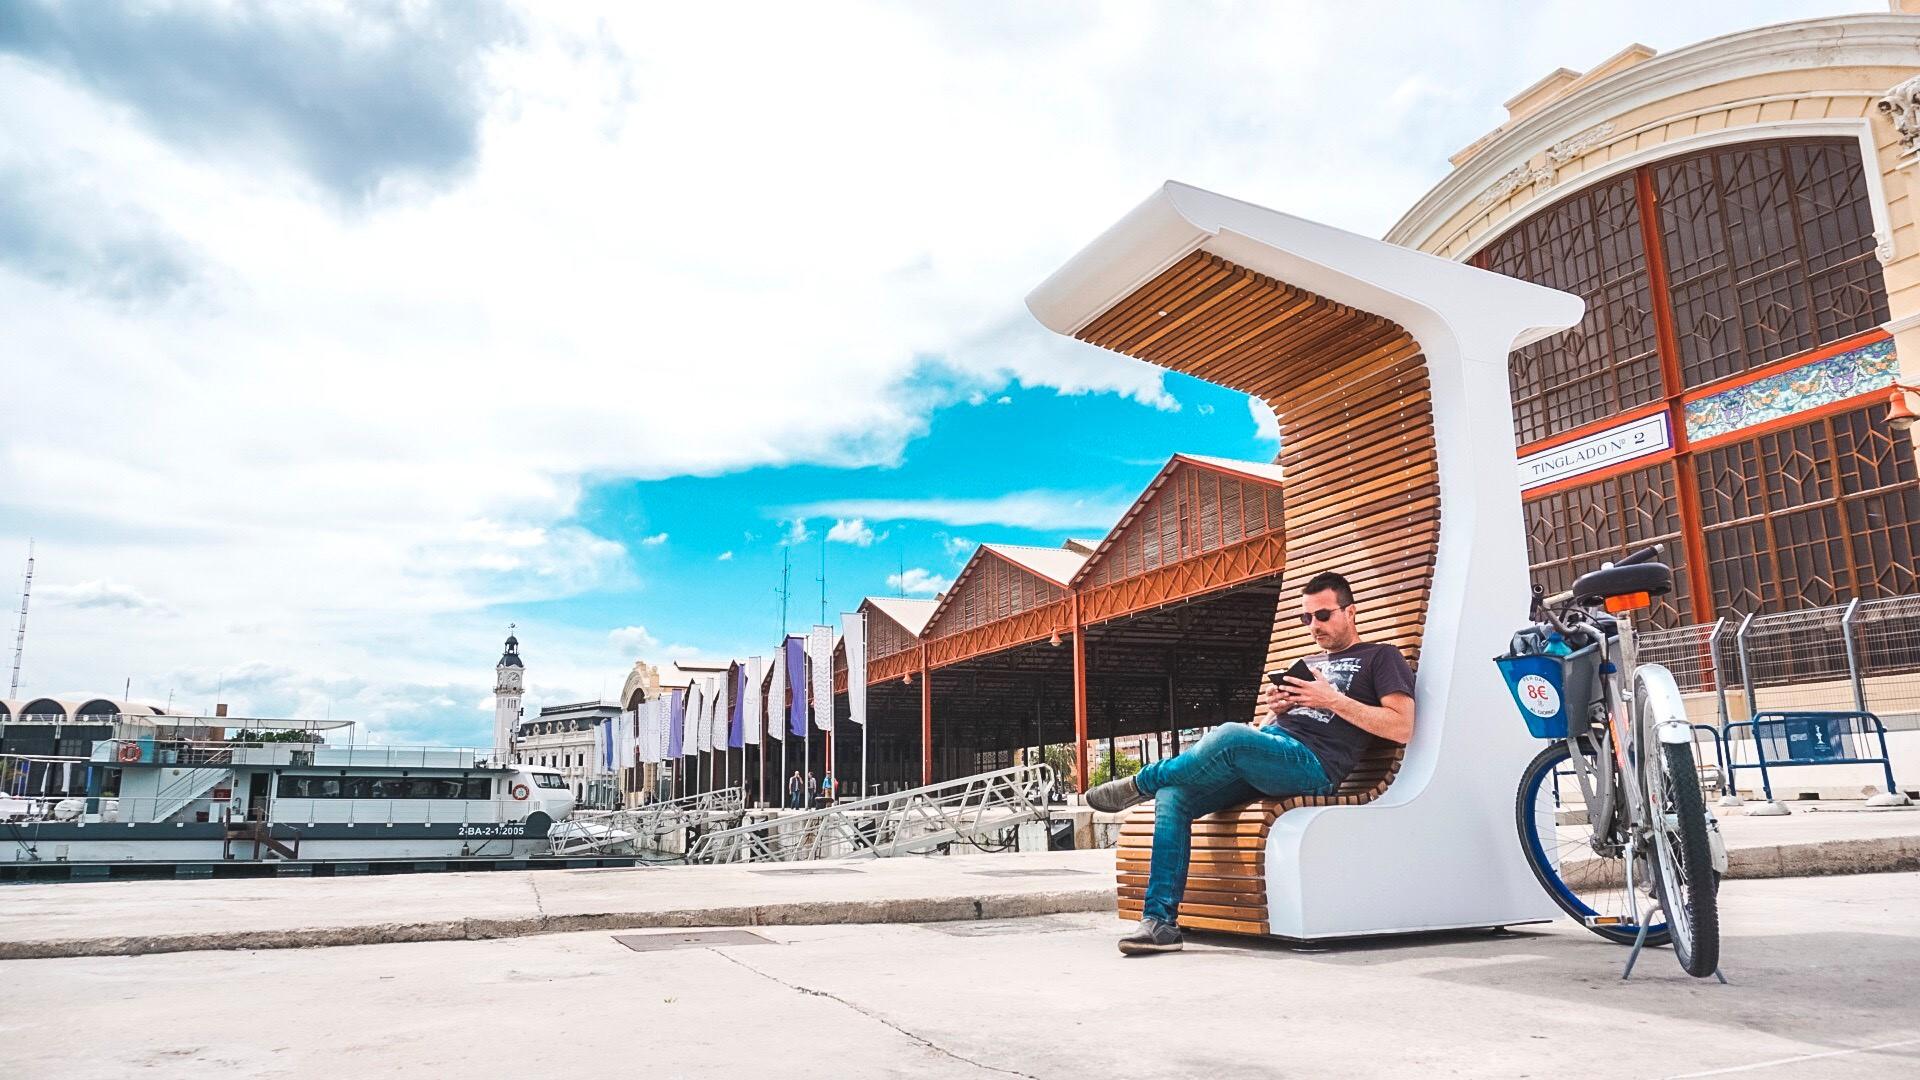 mobiliario urbano inteligente